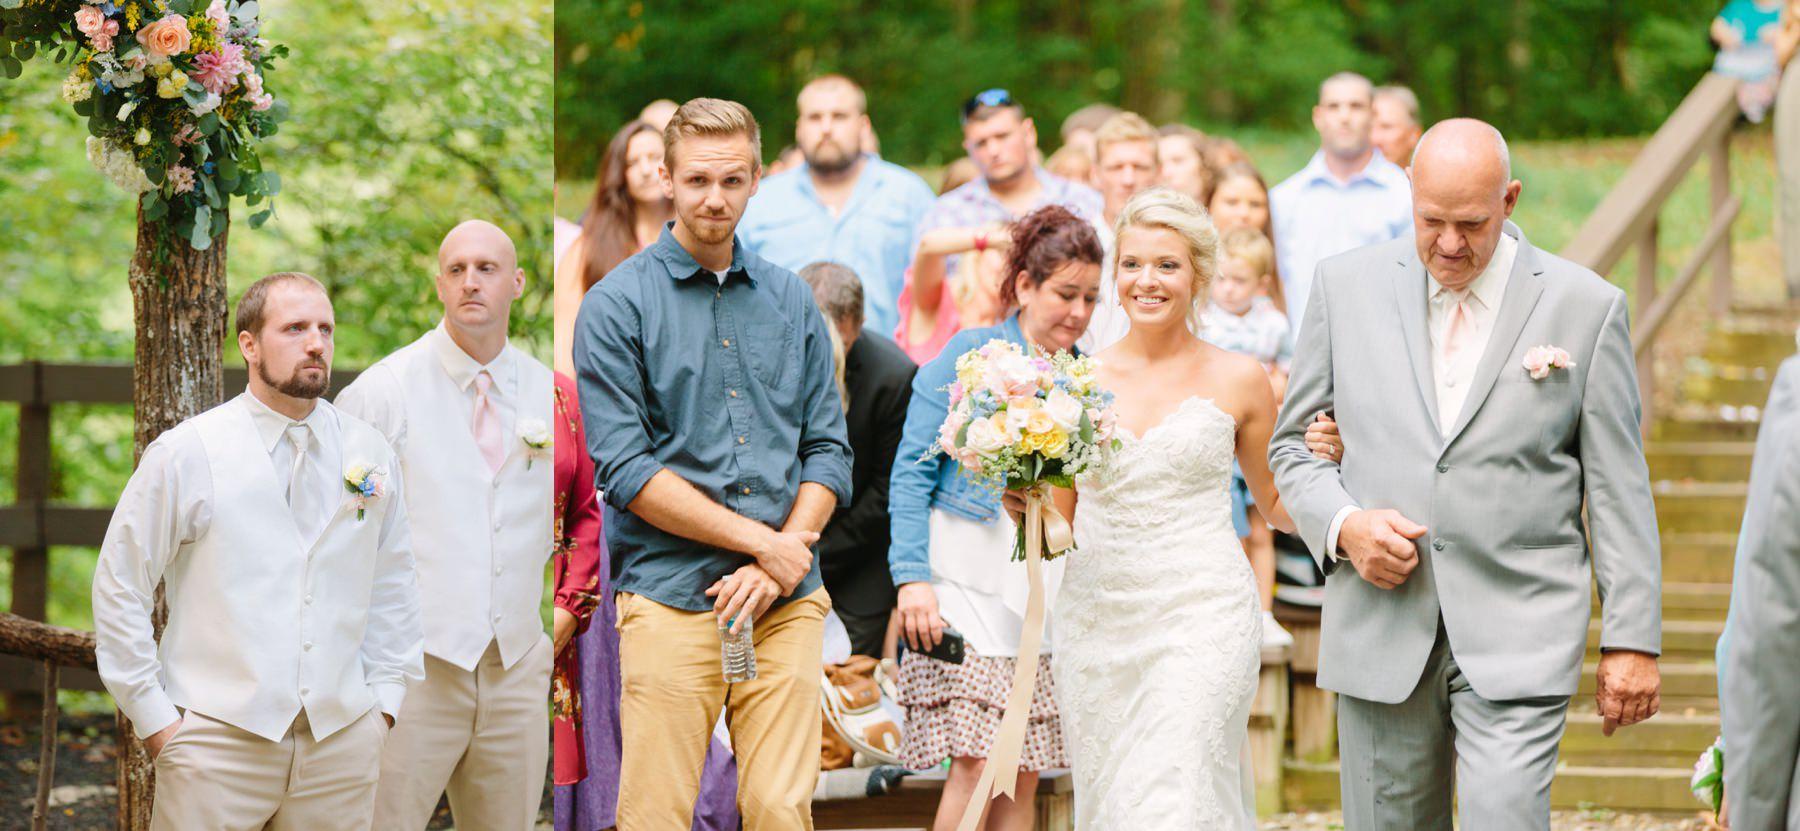 Tire Swing Photography | Timeless Charm Wedding | Camden, Ohio 12